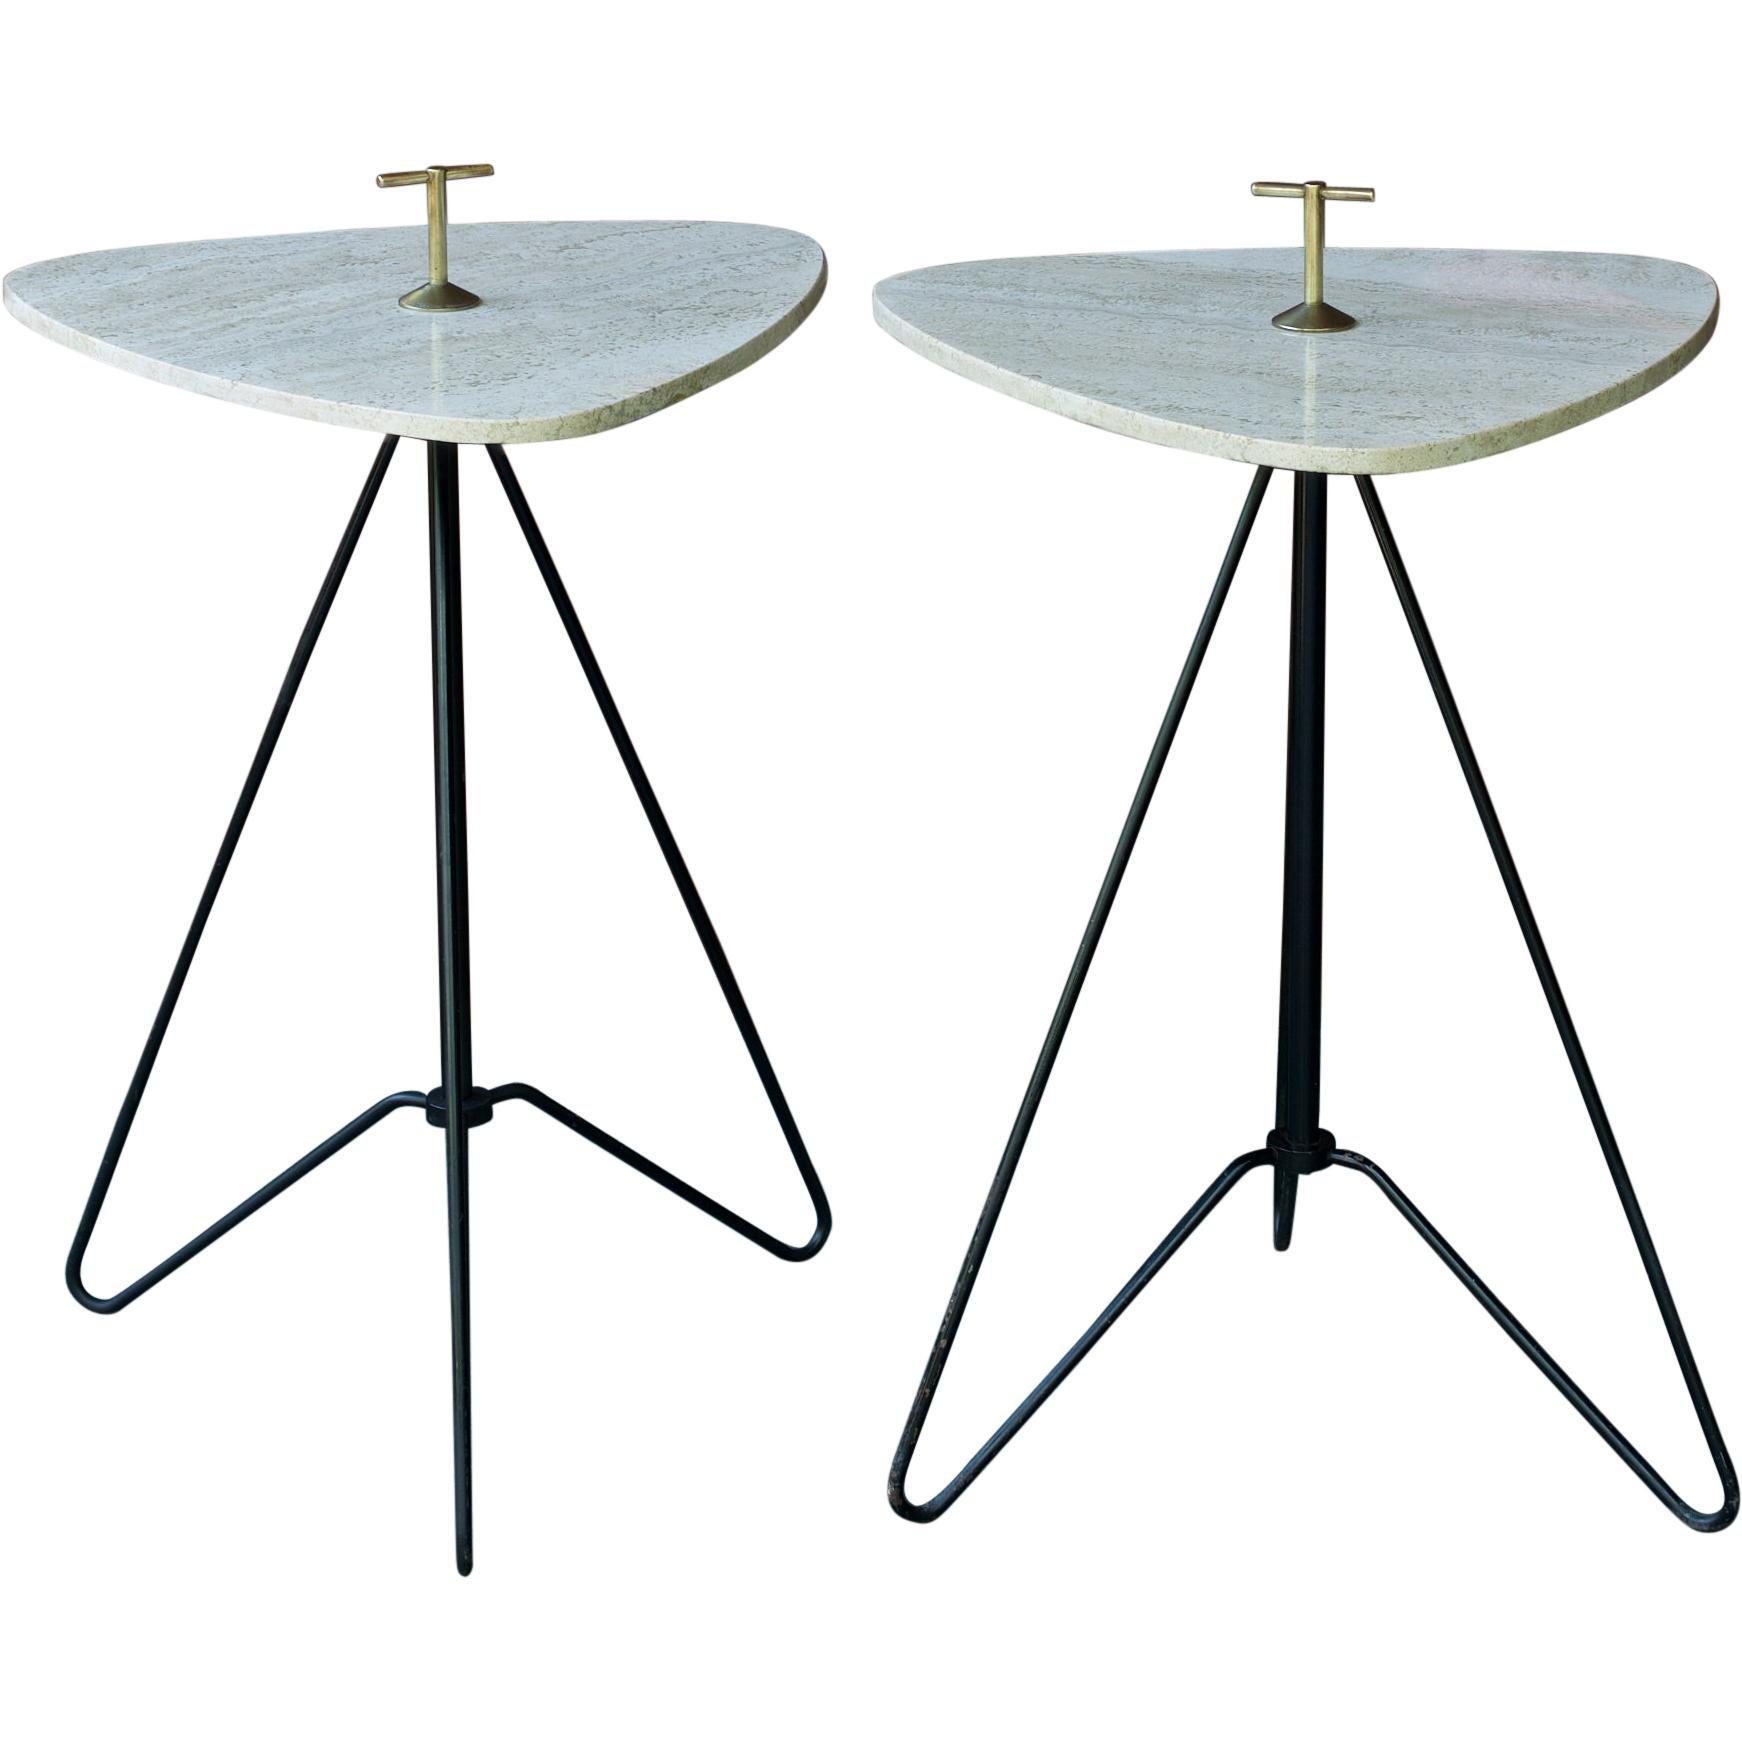 1950s Heifetz Travertine Bronze Smoke Stand Tables Atomic Post-War Modern Pair